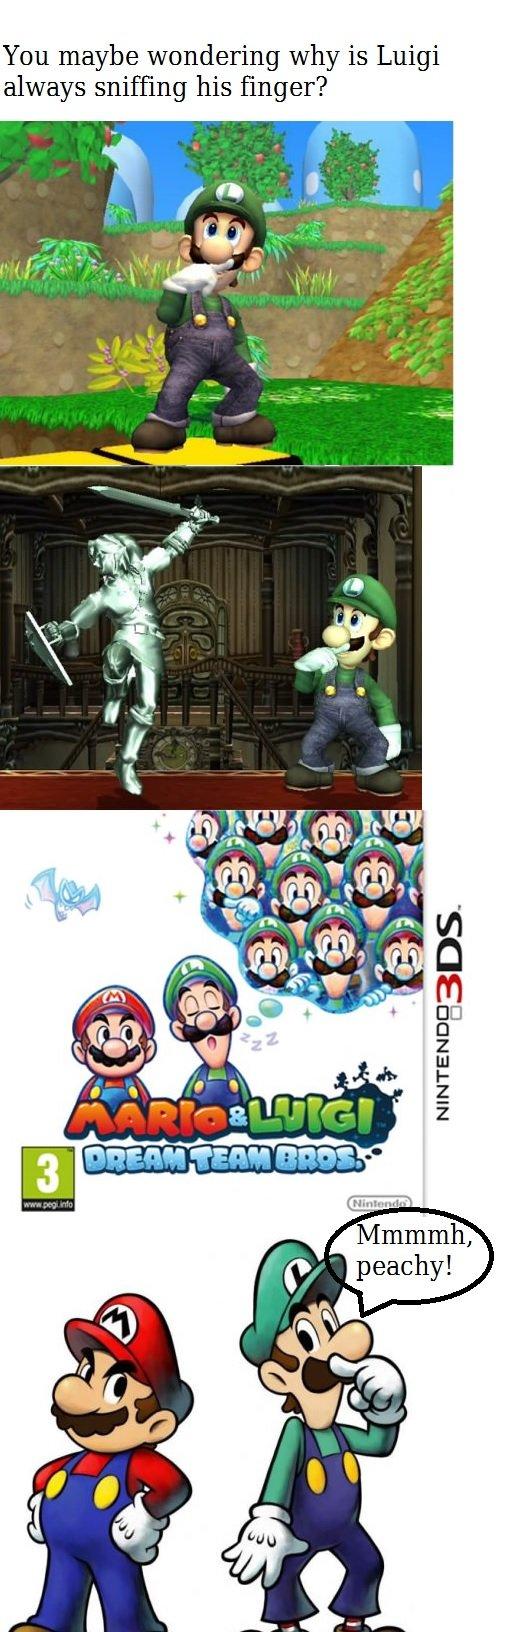 subtlety. Please recongnize my 1337 paitn skillz!. ban nun Una. Luigi you cunt!